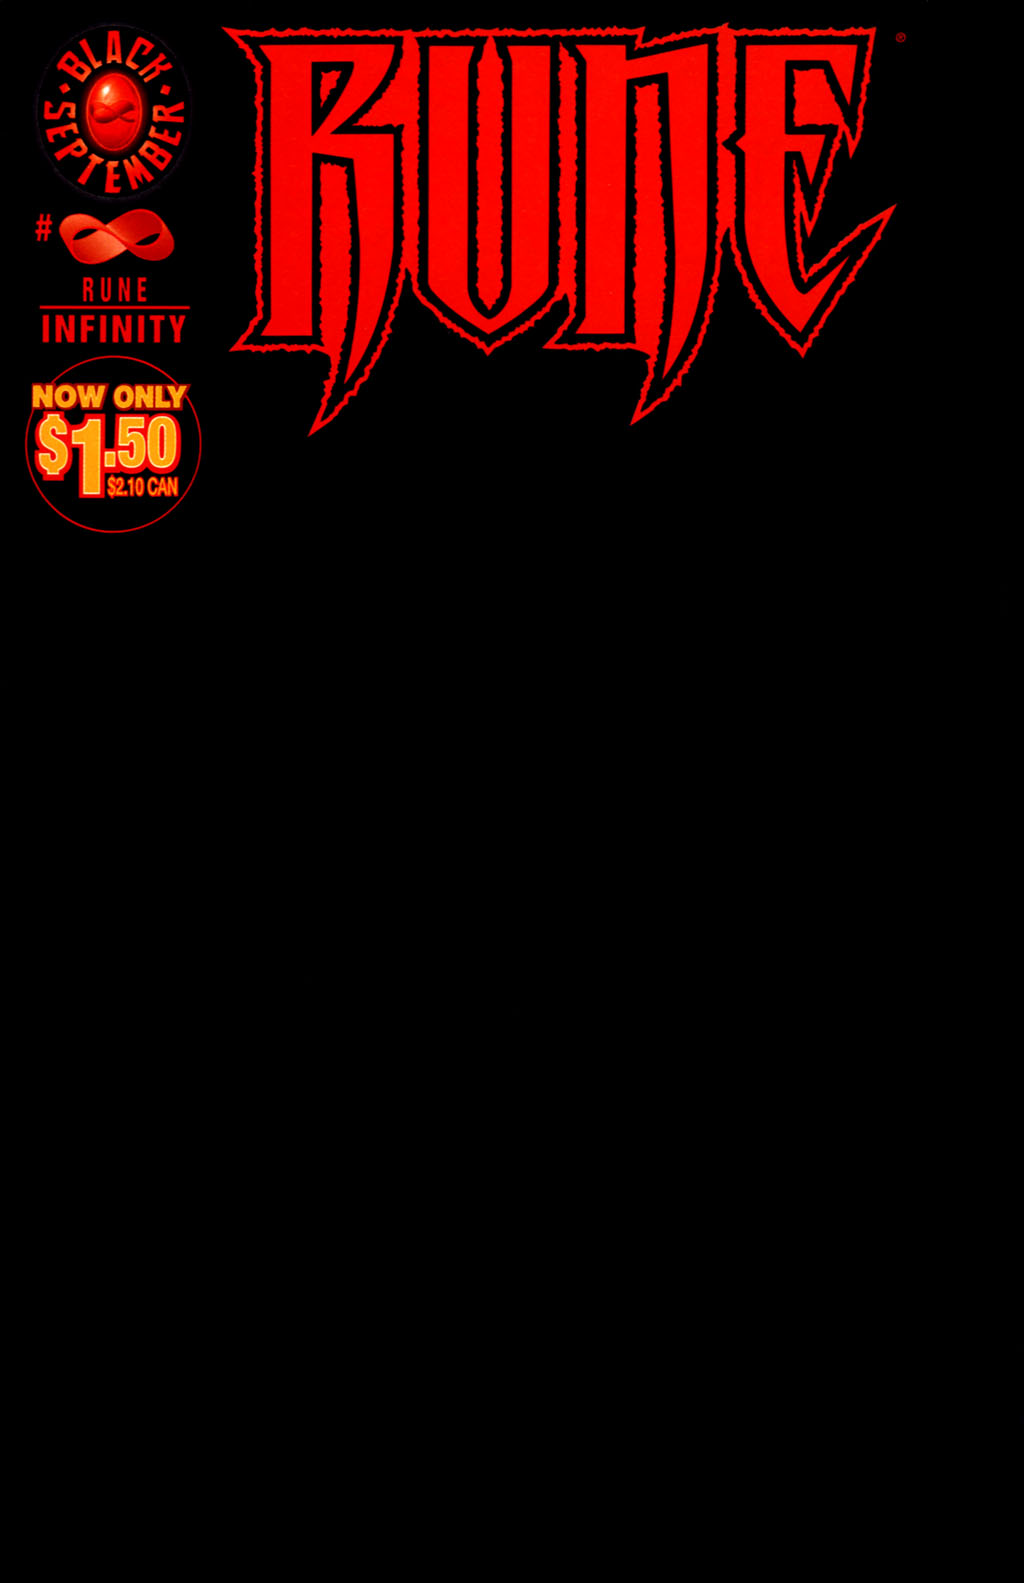 Read online Rune (1995) comic -  Issue # _Infinity - 1